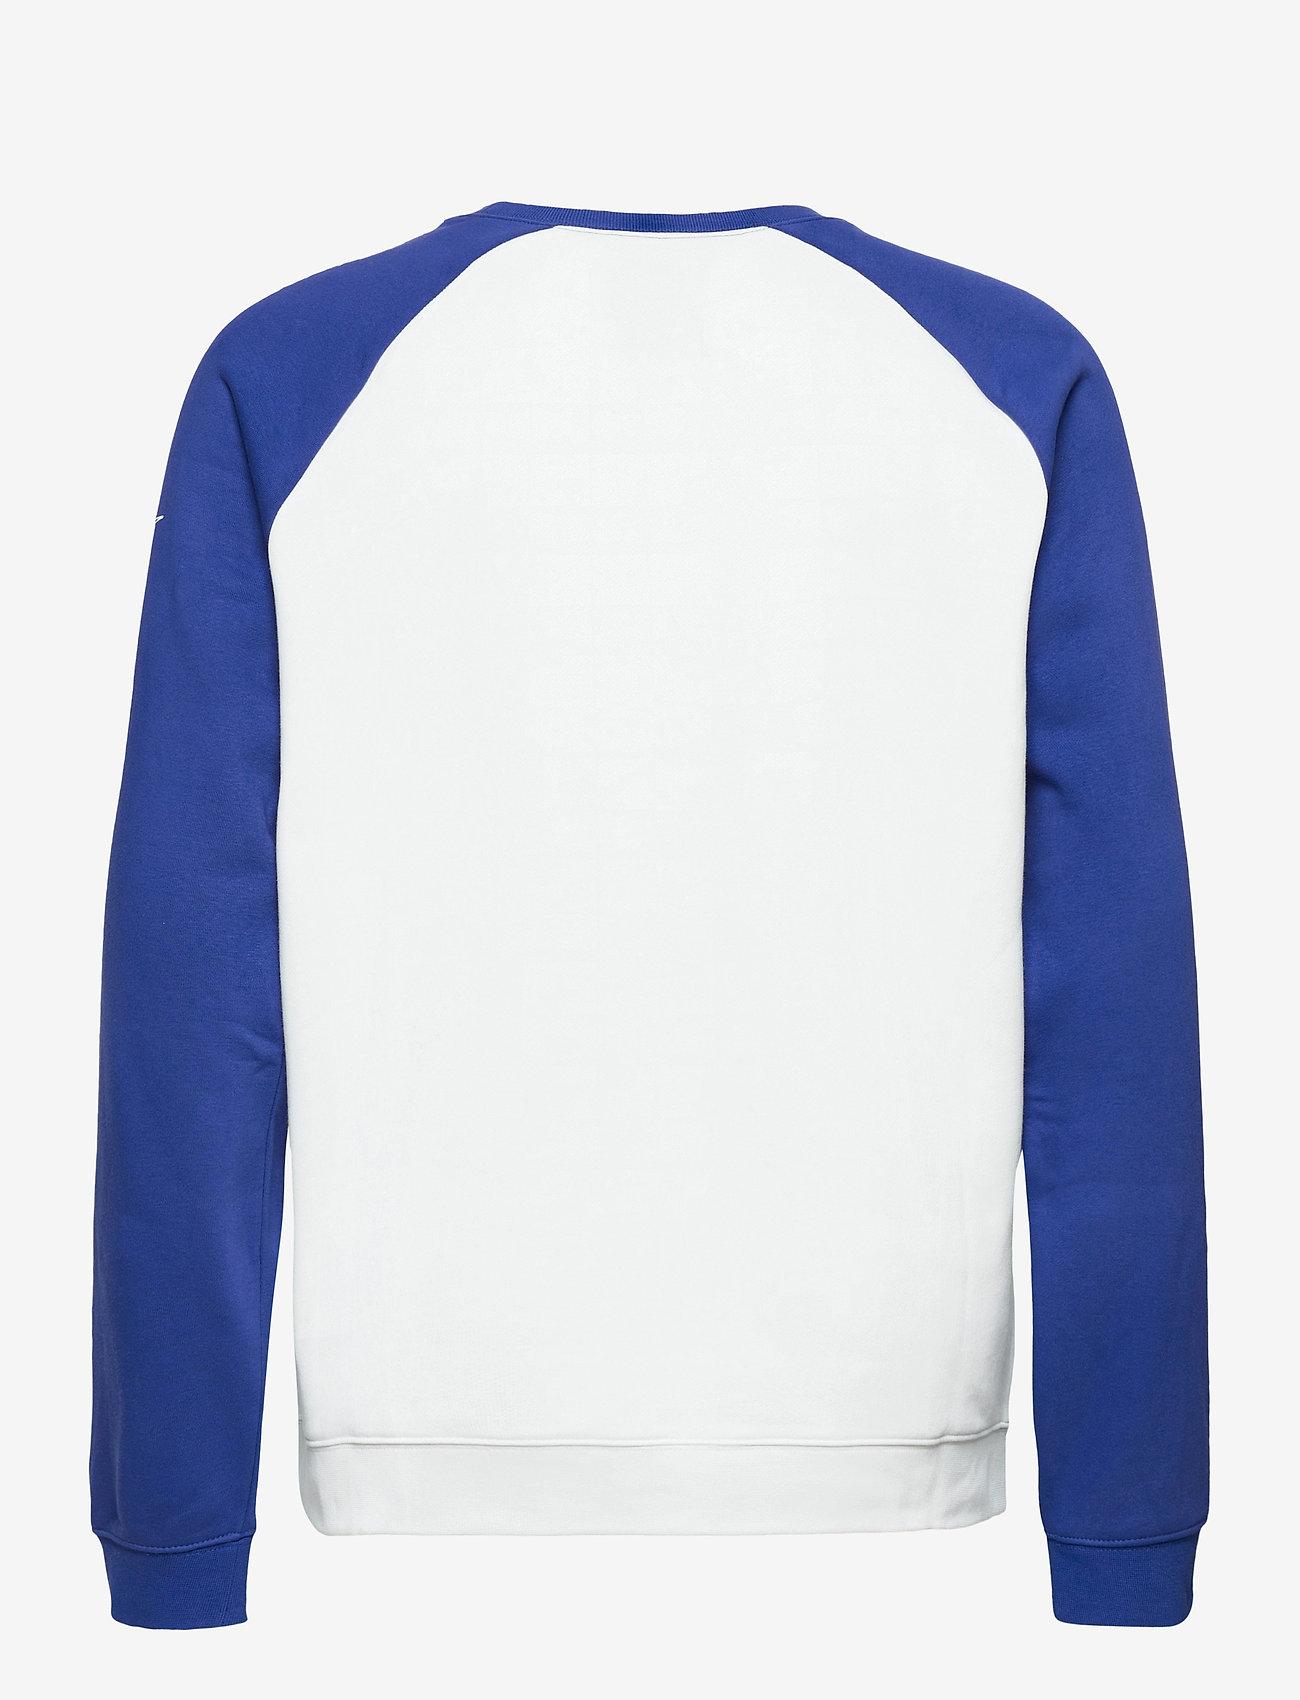 NIKE Fan Gear Dallas Cowboys Nike Go Helmet Historic Raglan - Sweatshirts WHITE / OLD ROYAL - Menn Klær